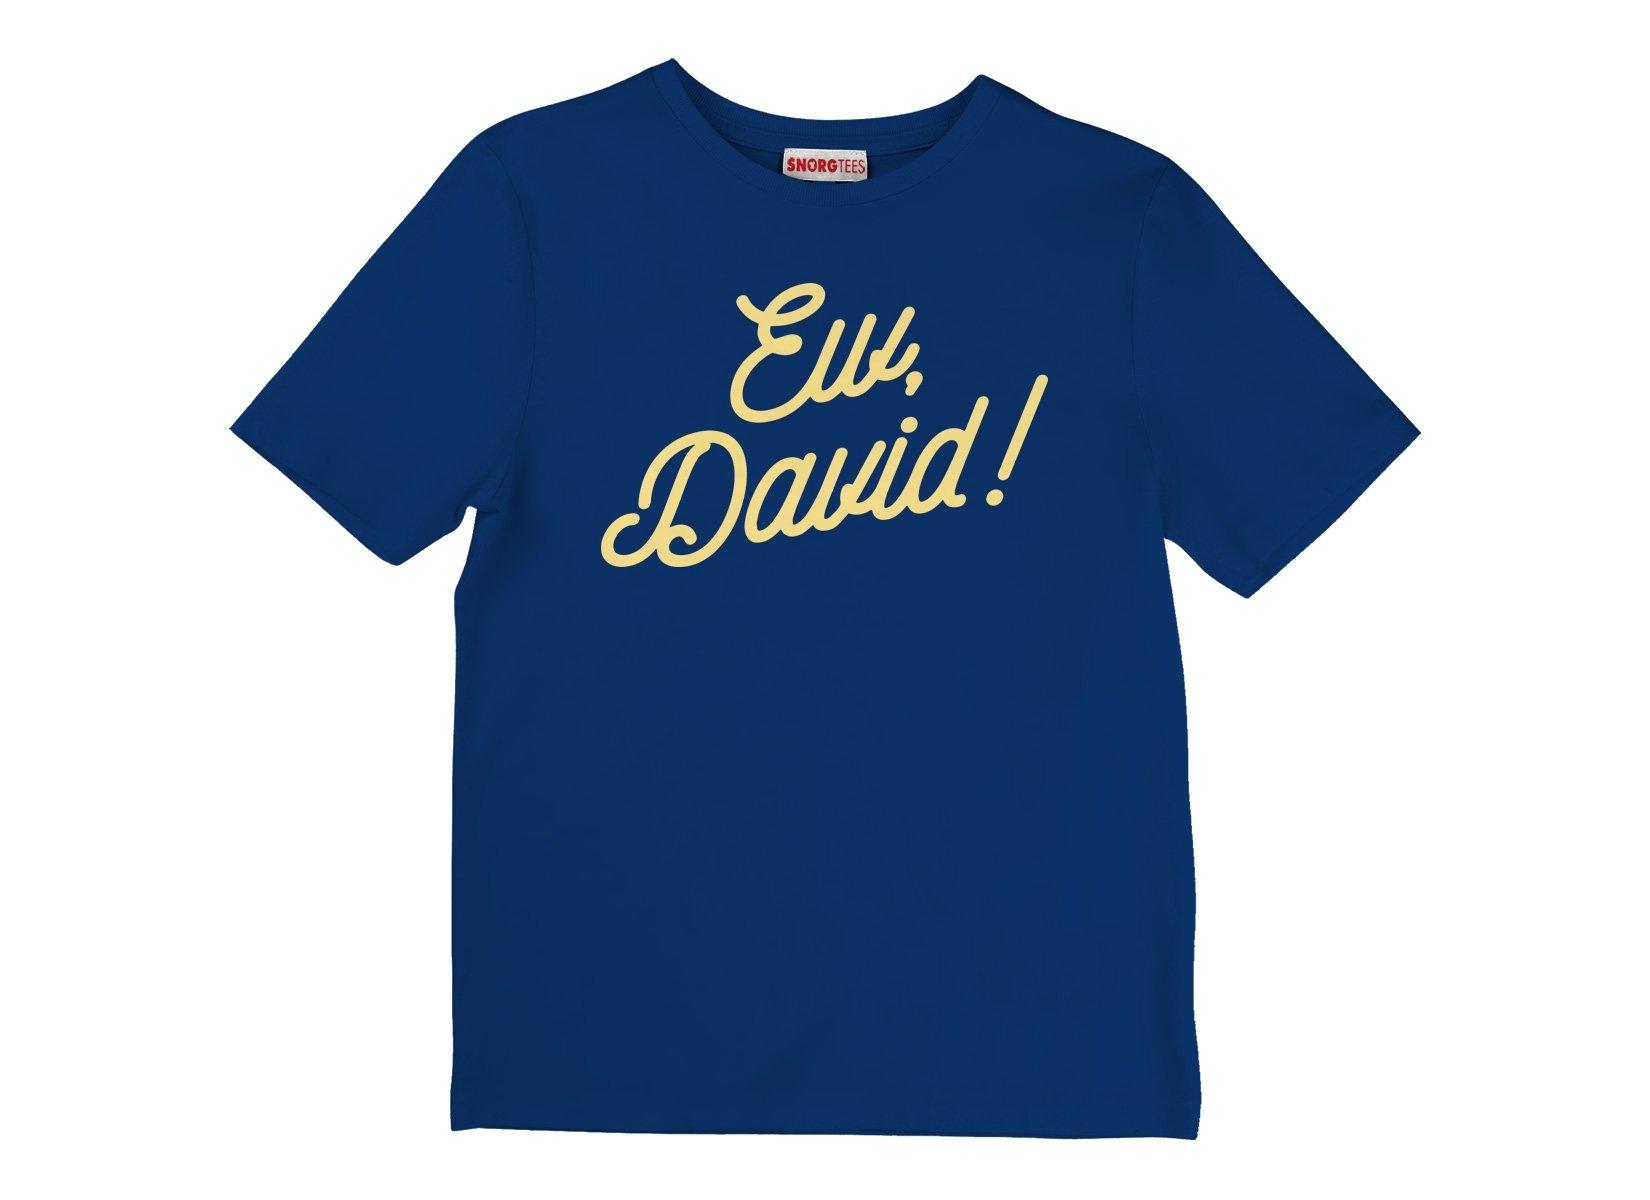 Ew, David! on Kids T-Shirt